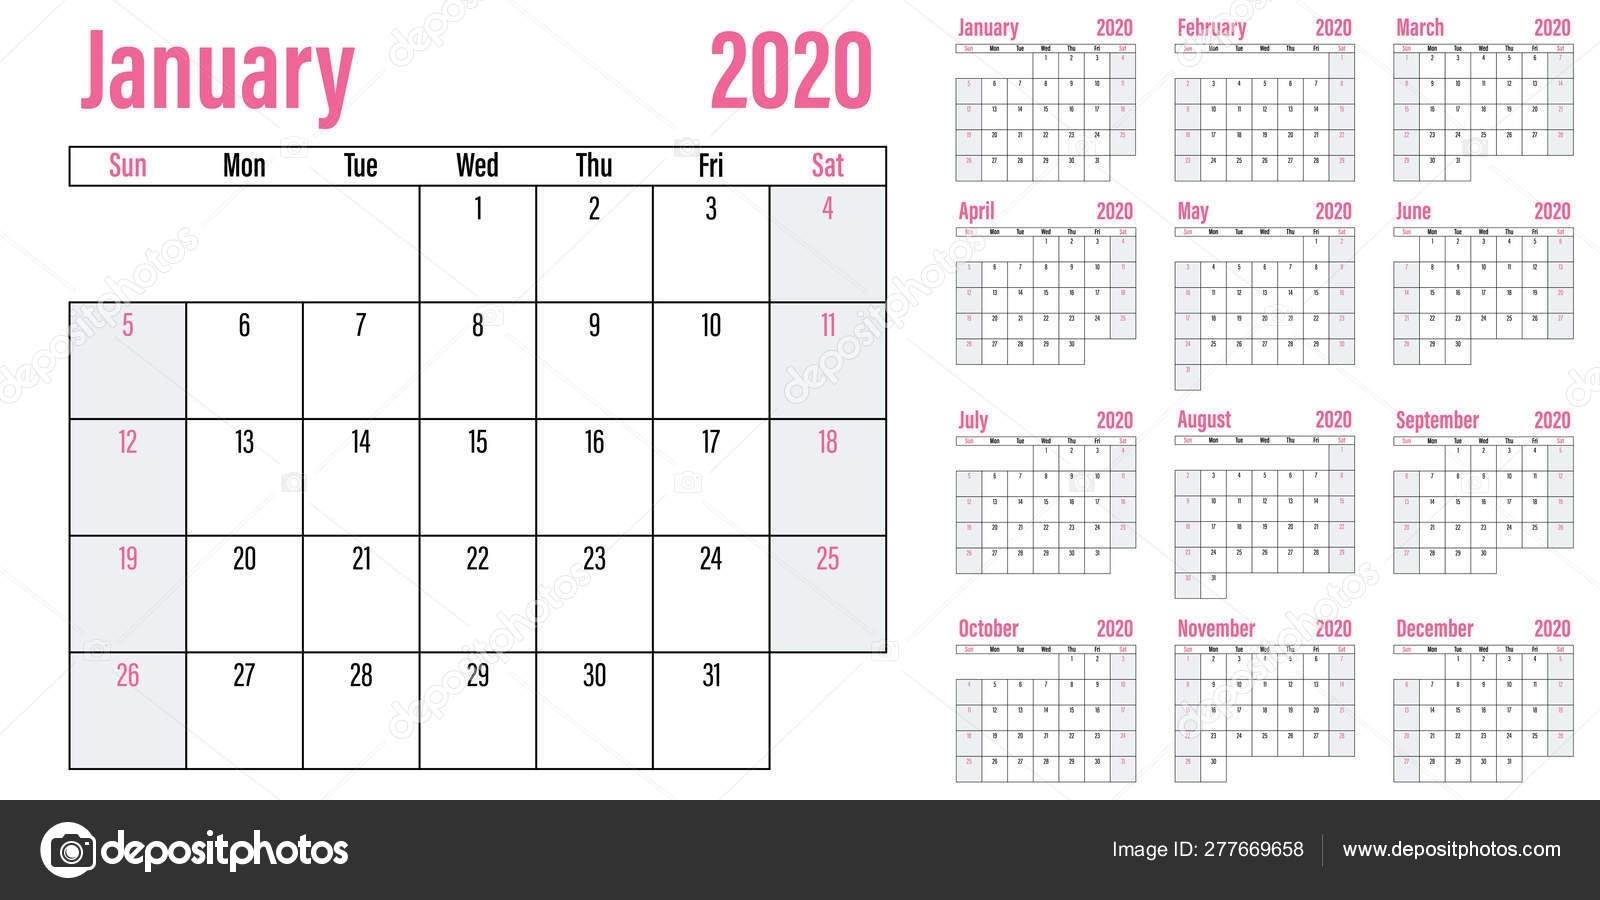 Calendar Planner 2020 Template Vector Illustration All Months Week Starts — Stock Vector